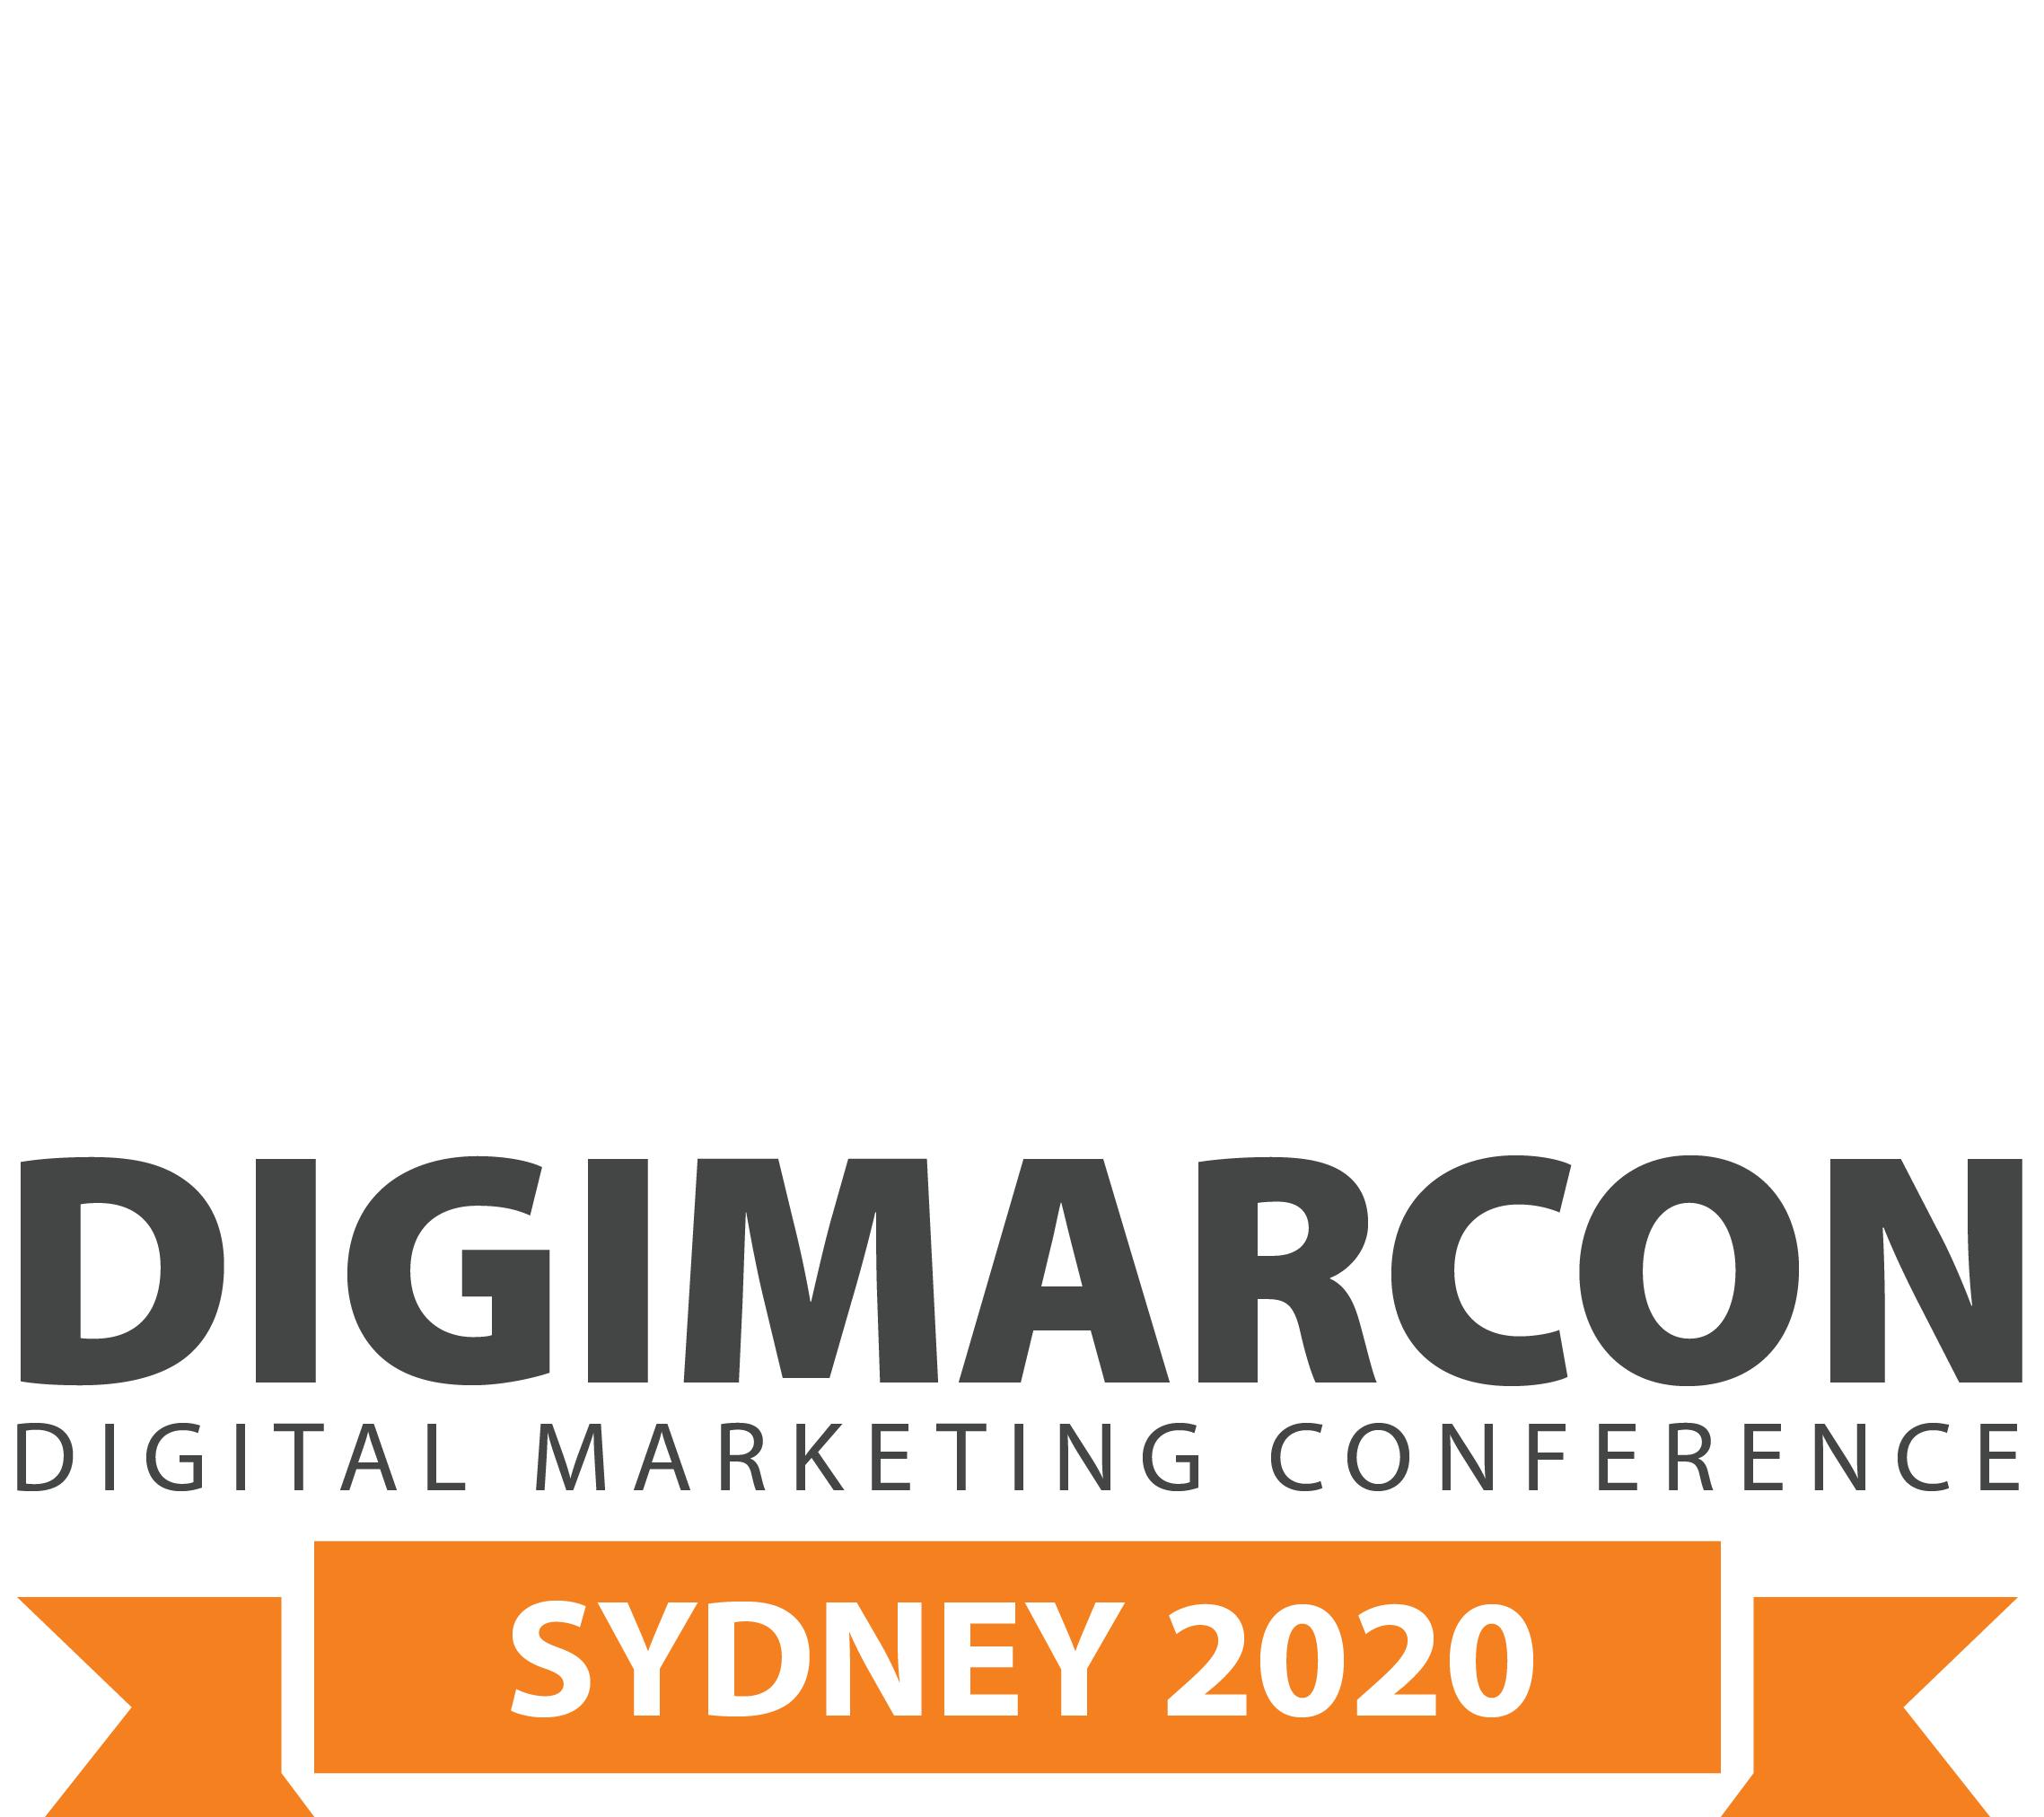 DigiMarCon Sydney – Digital Marketing, Media and Advertising Conference